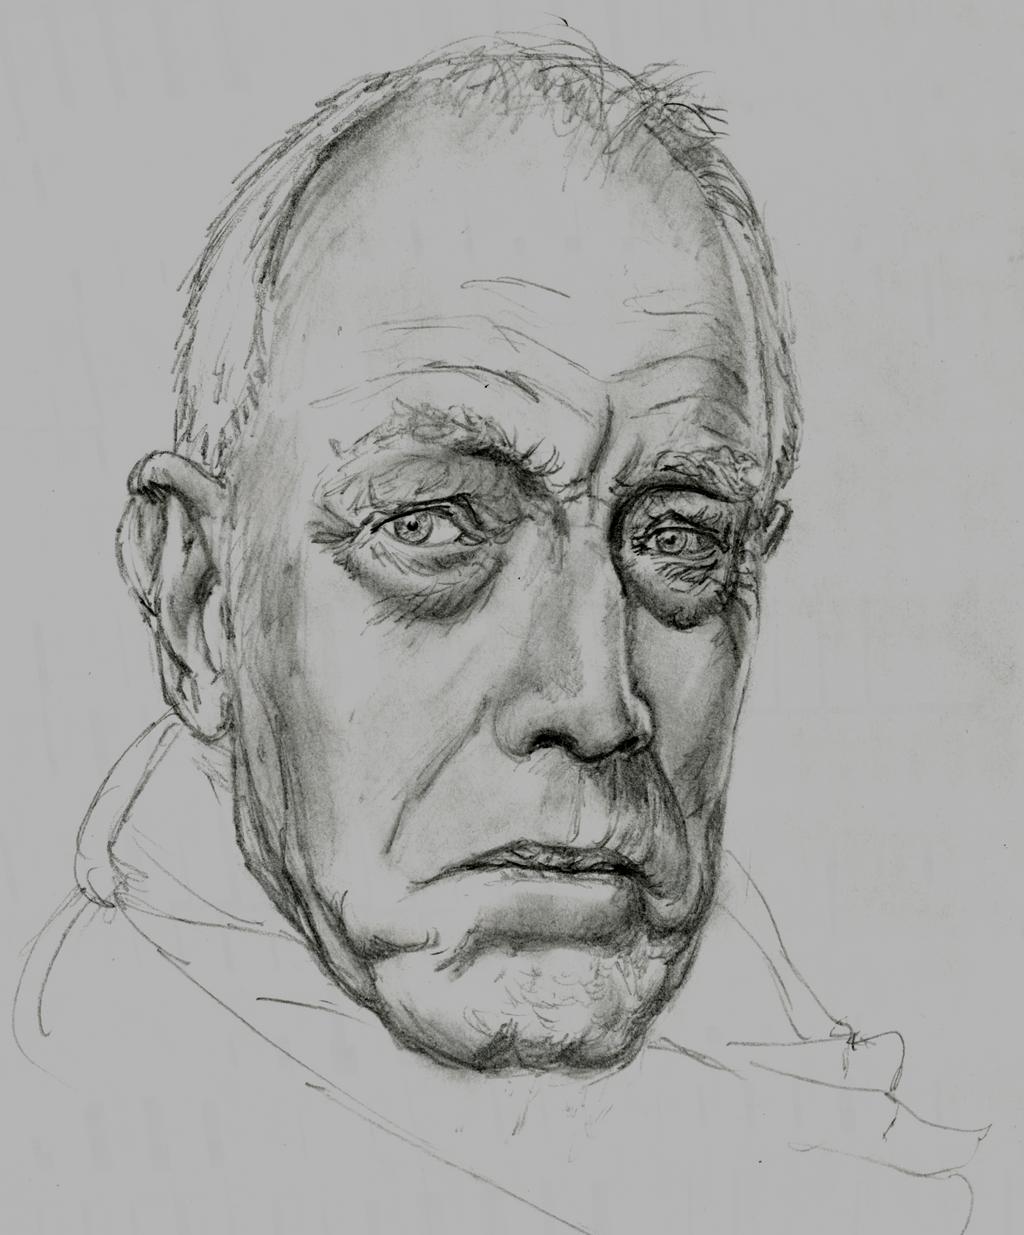 random portrait - Max Von Sydow by hieronymushoefer